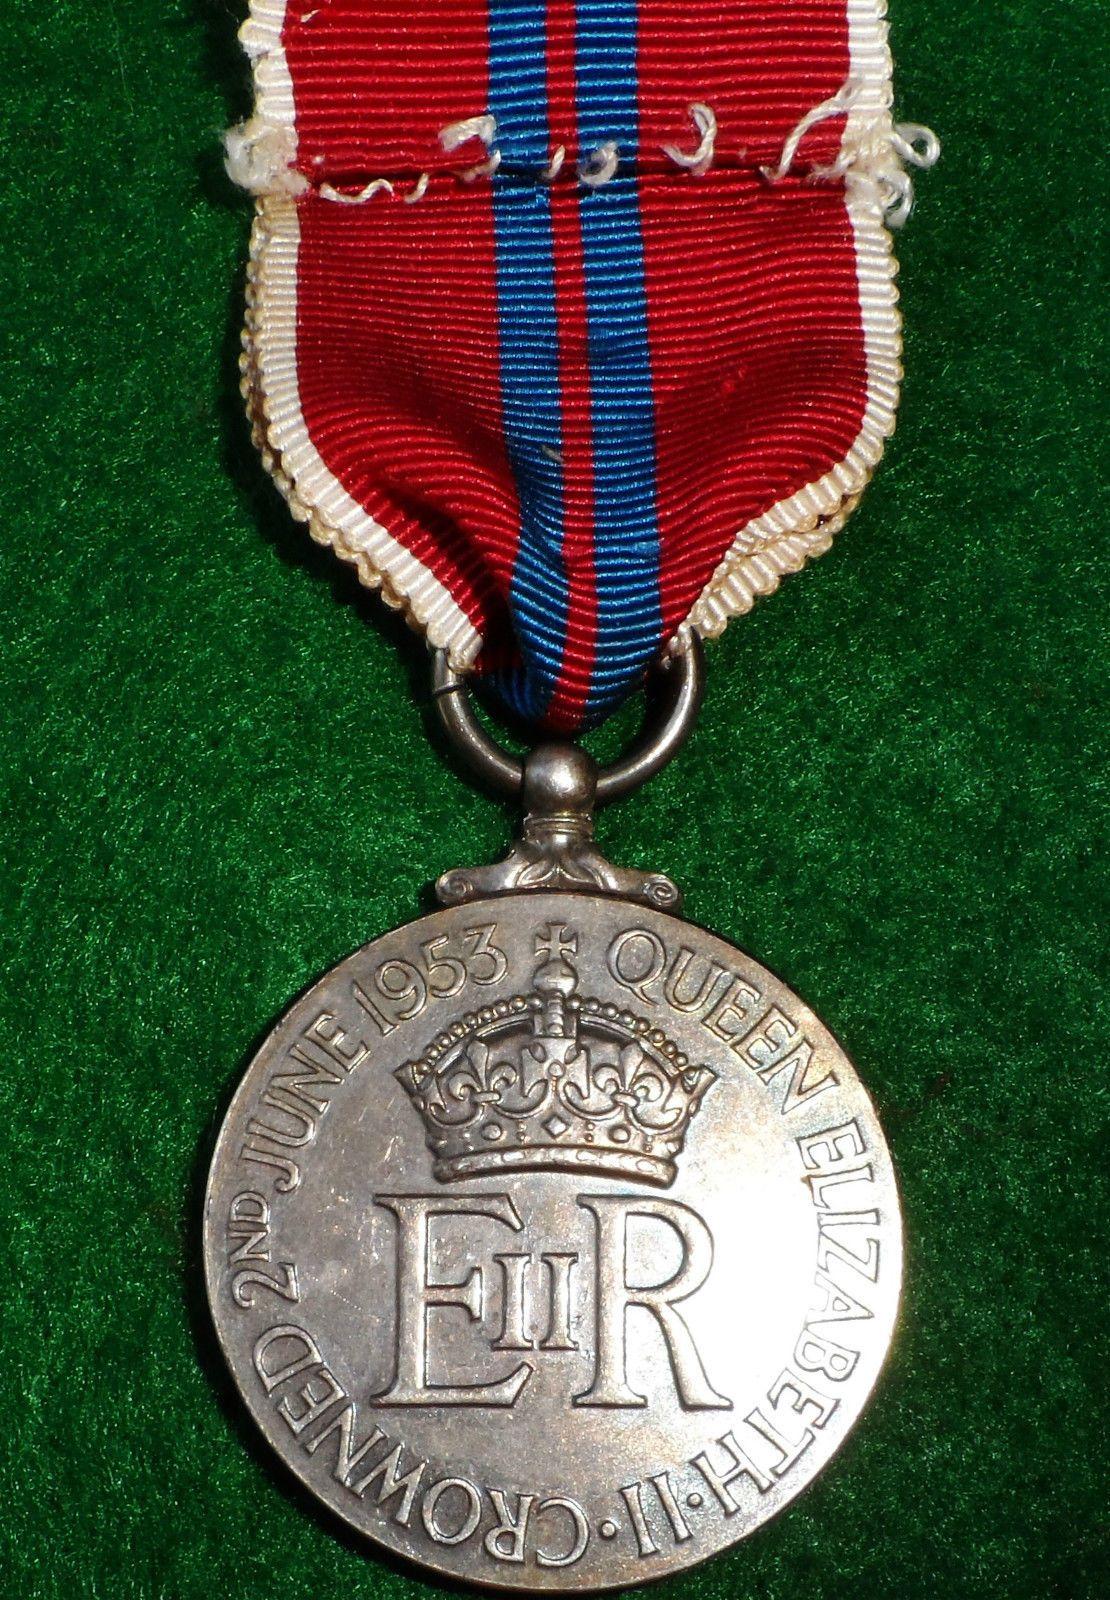 vintage post war 1953 british royal coronation medal queen elizabeth ii jb military antiques vintage post war 1953 british royal coronation medal queen elizabeth ii